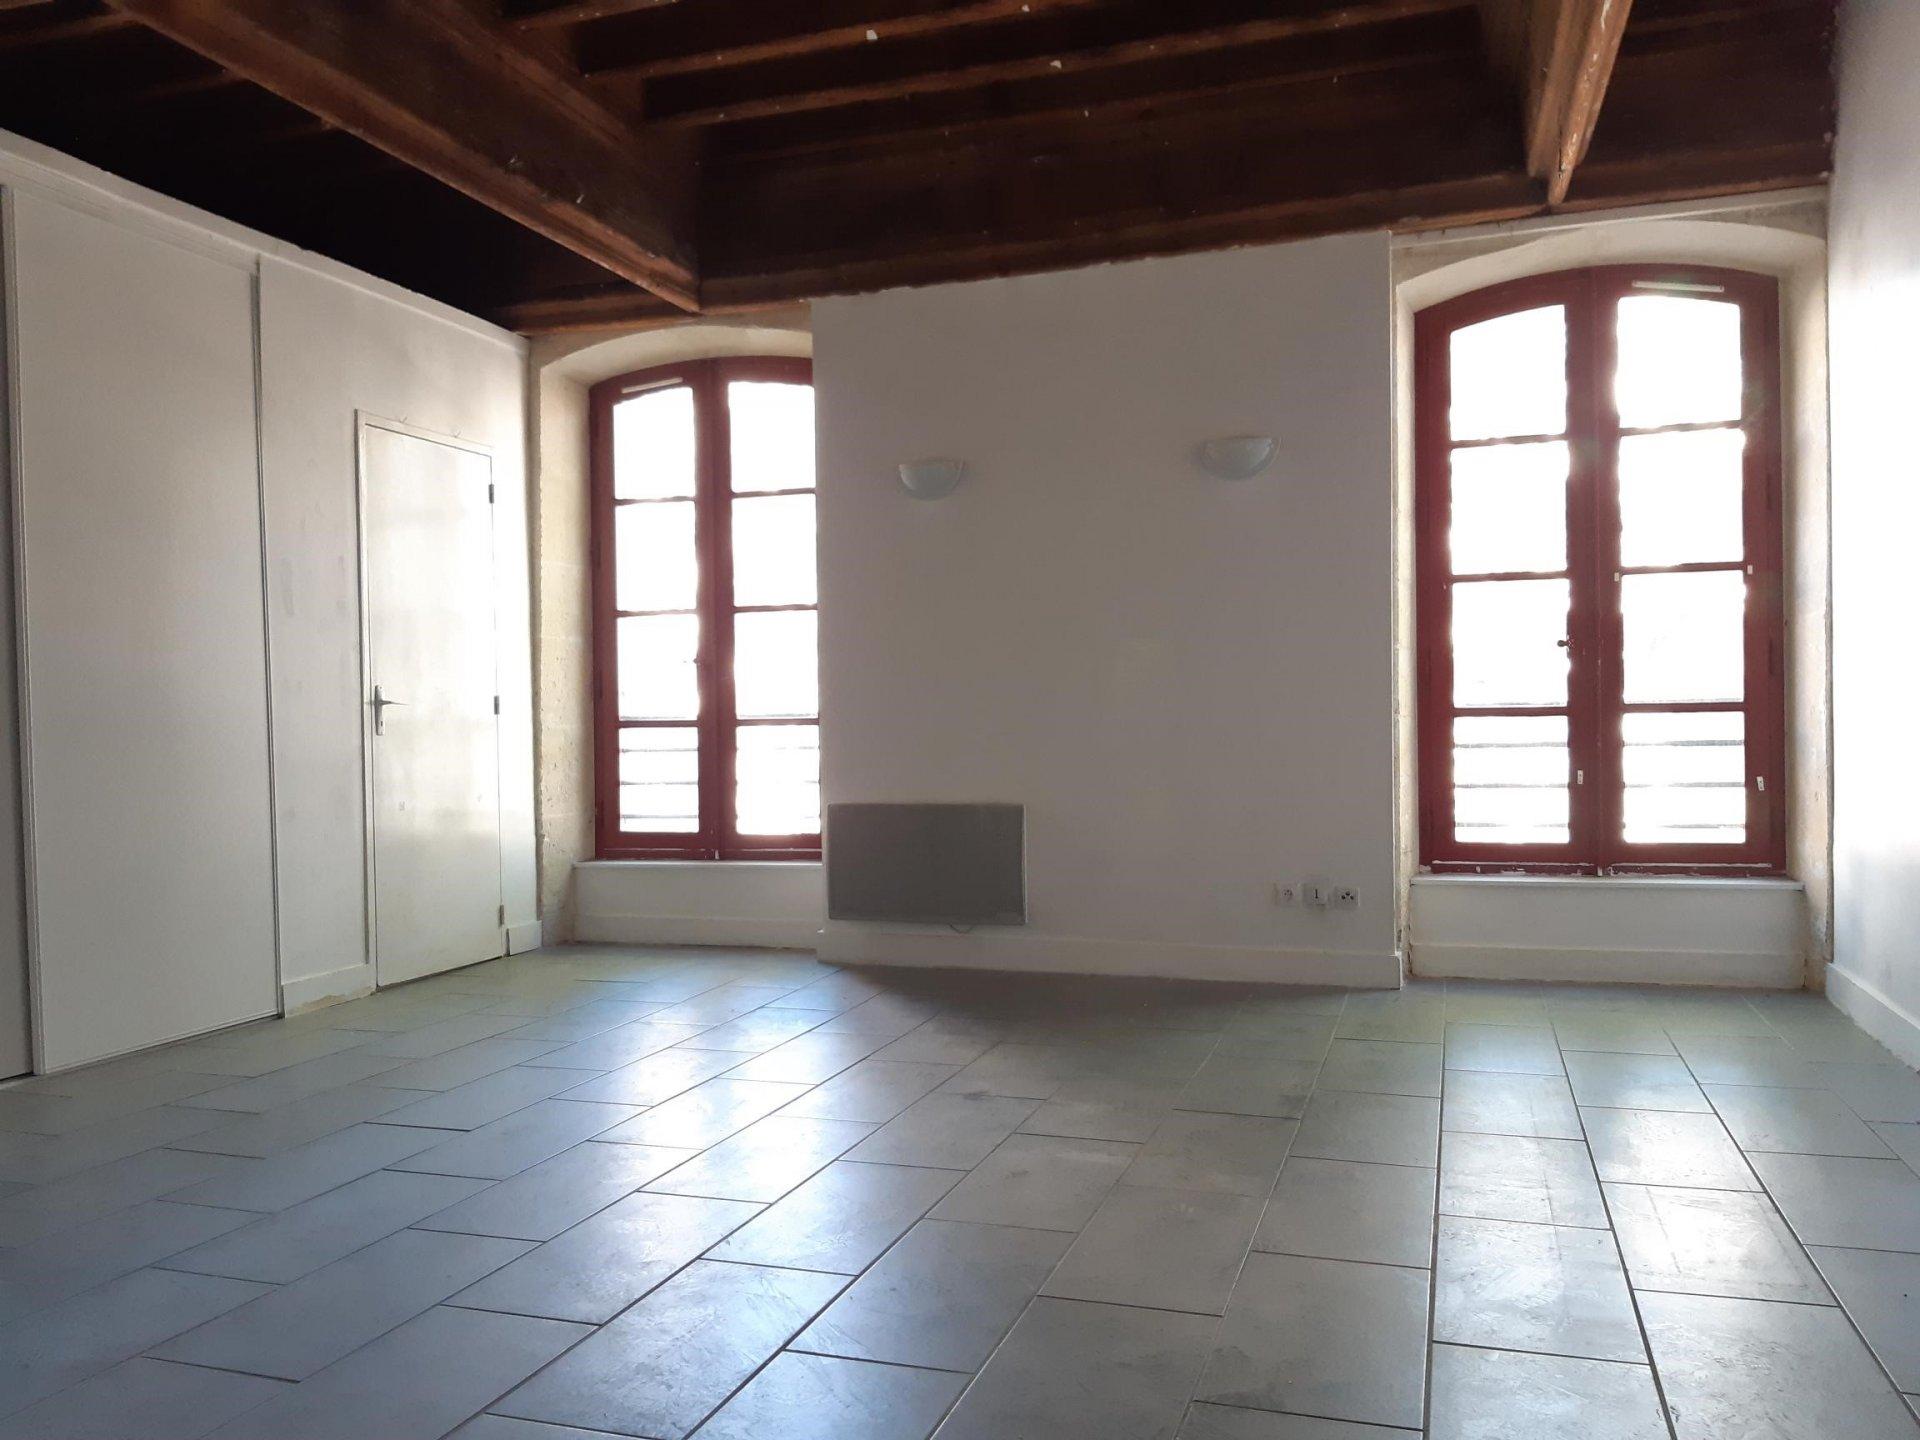 Location Appartement BEAUCAIRE Mandat : 0210